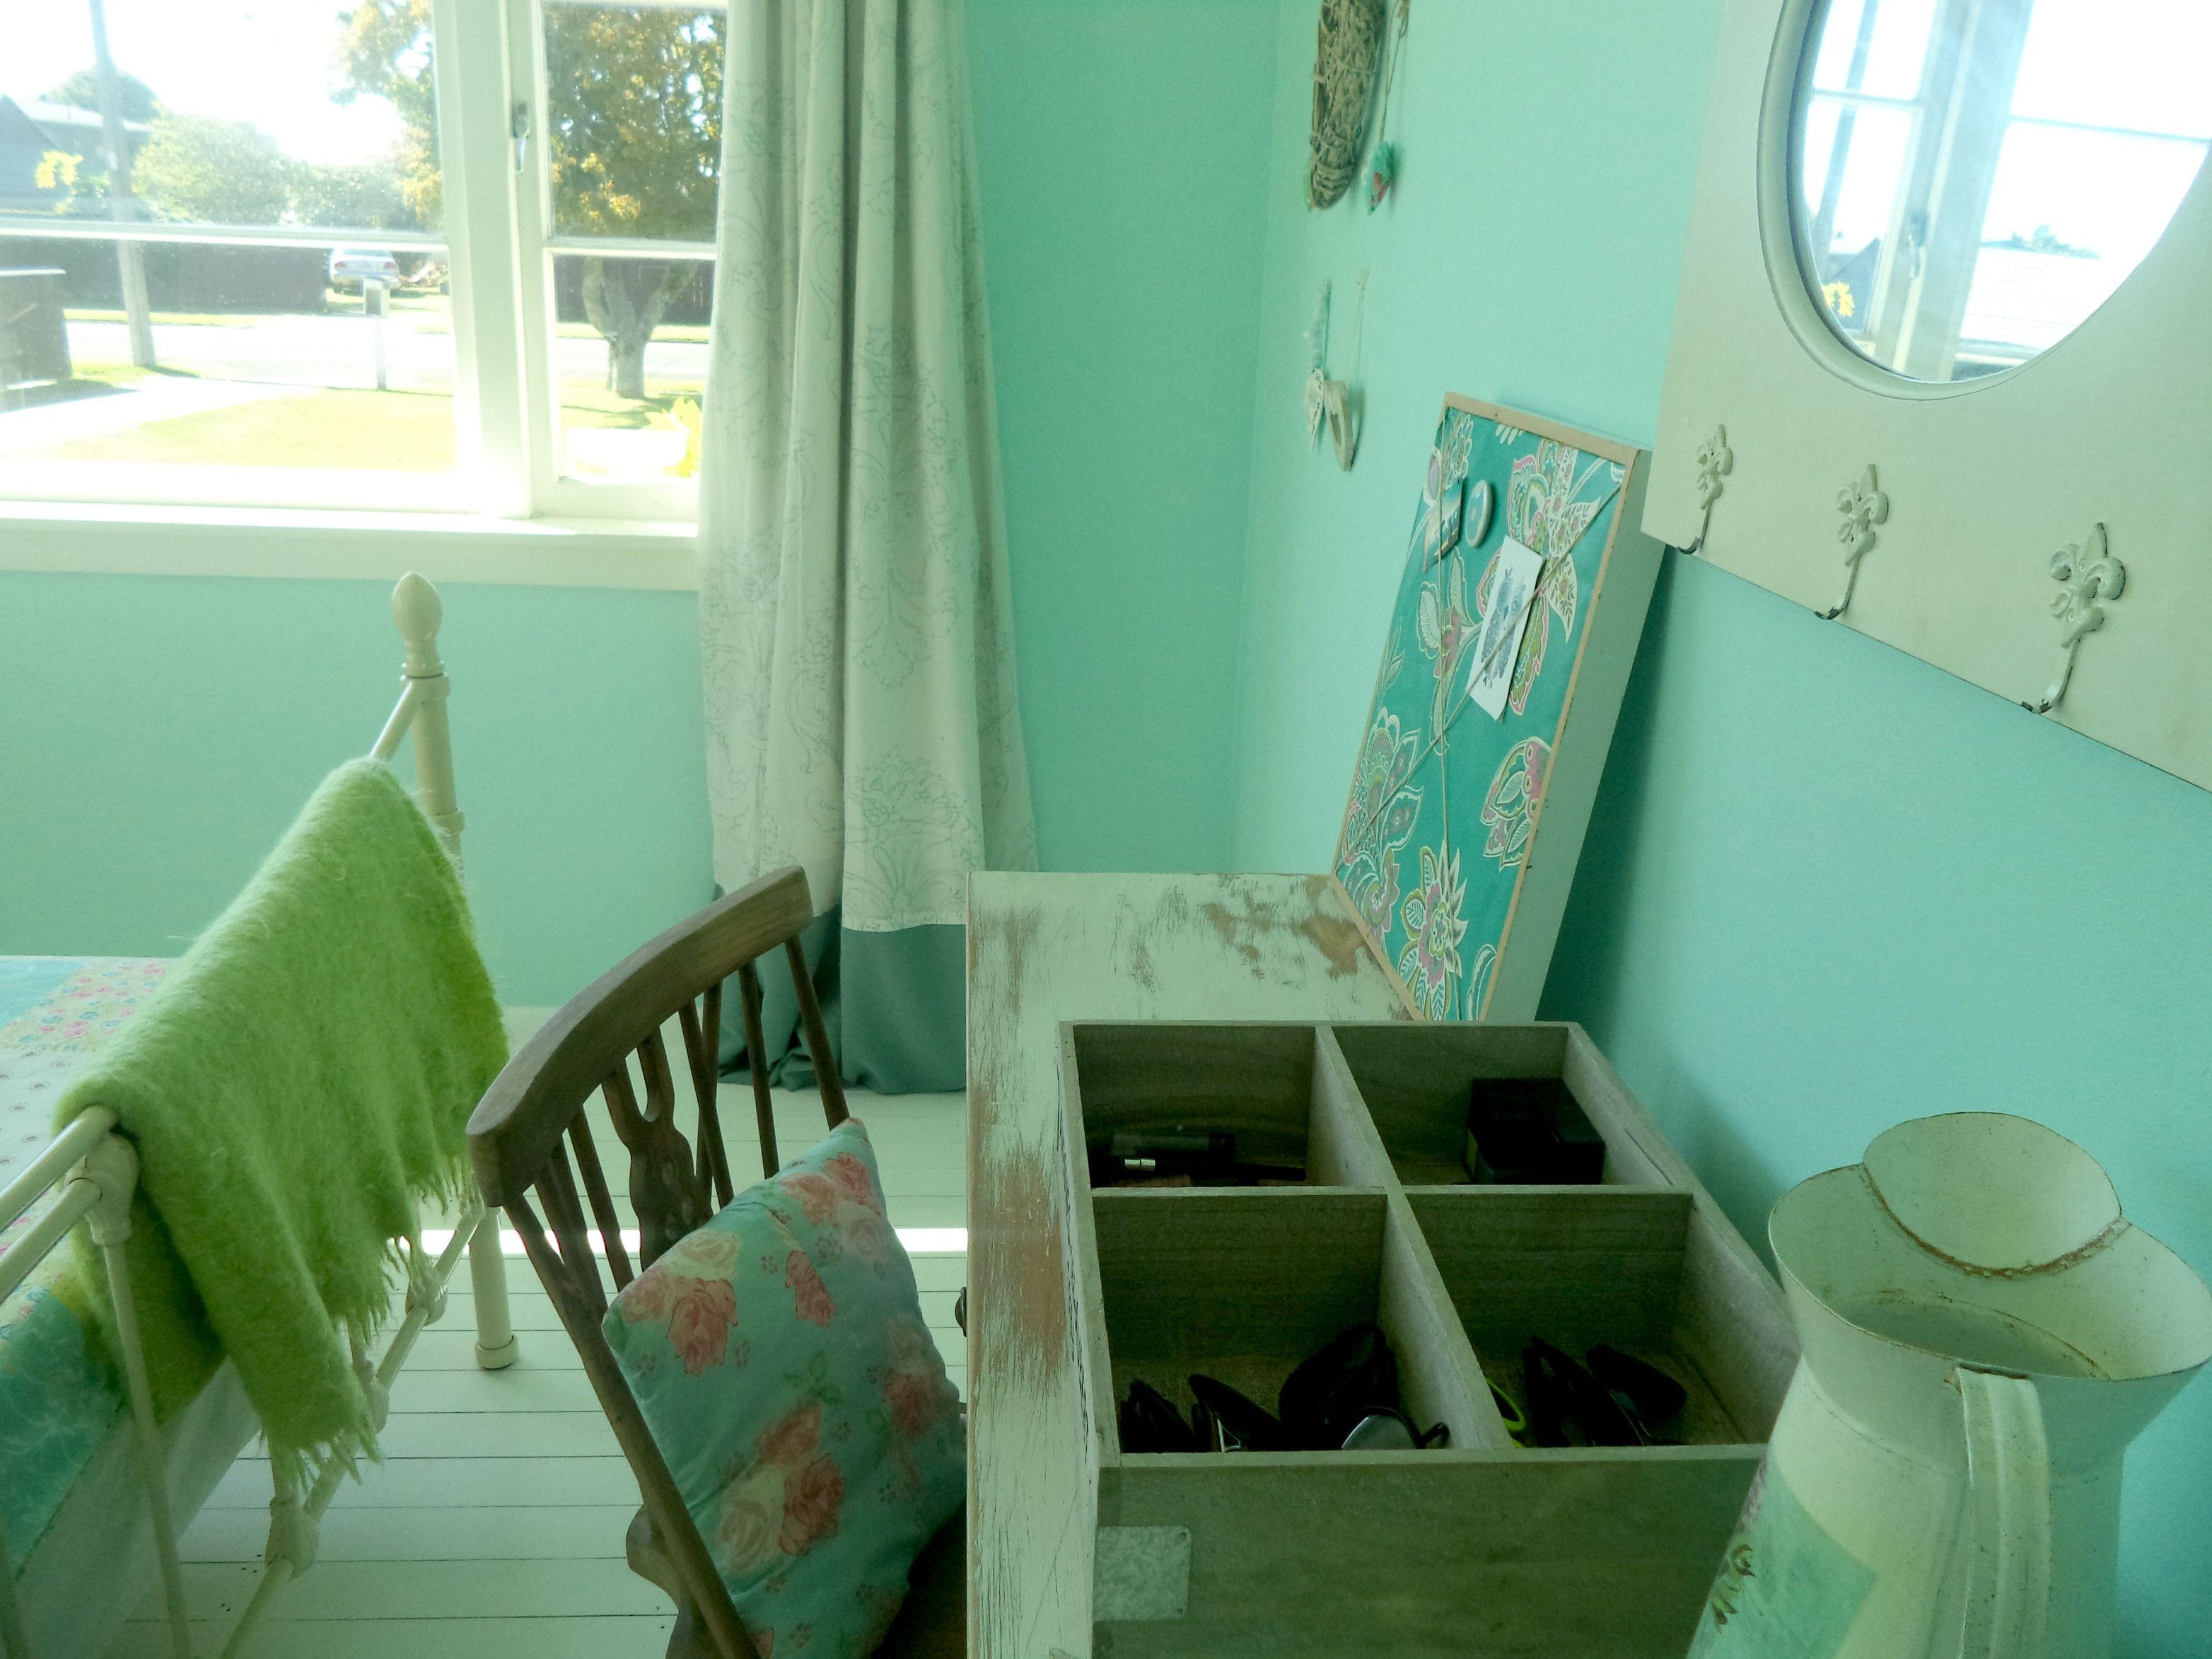 duck egg blue shabby. Teenage Girls Bedroom: A Teal/Duck Egg Blue Shade With Shabby Chic, Vintage Duck